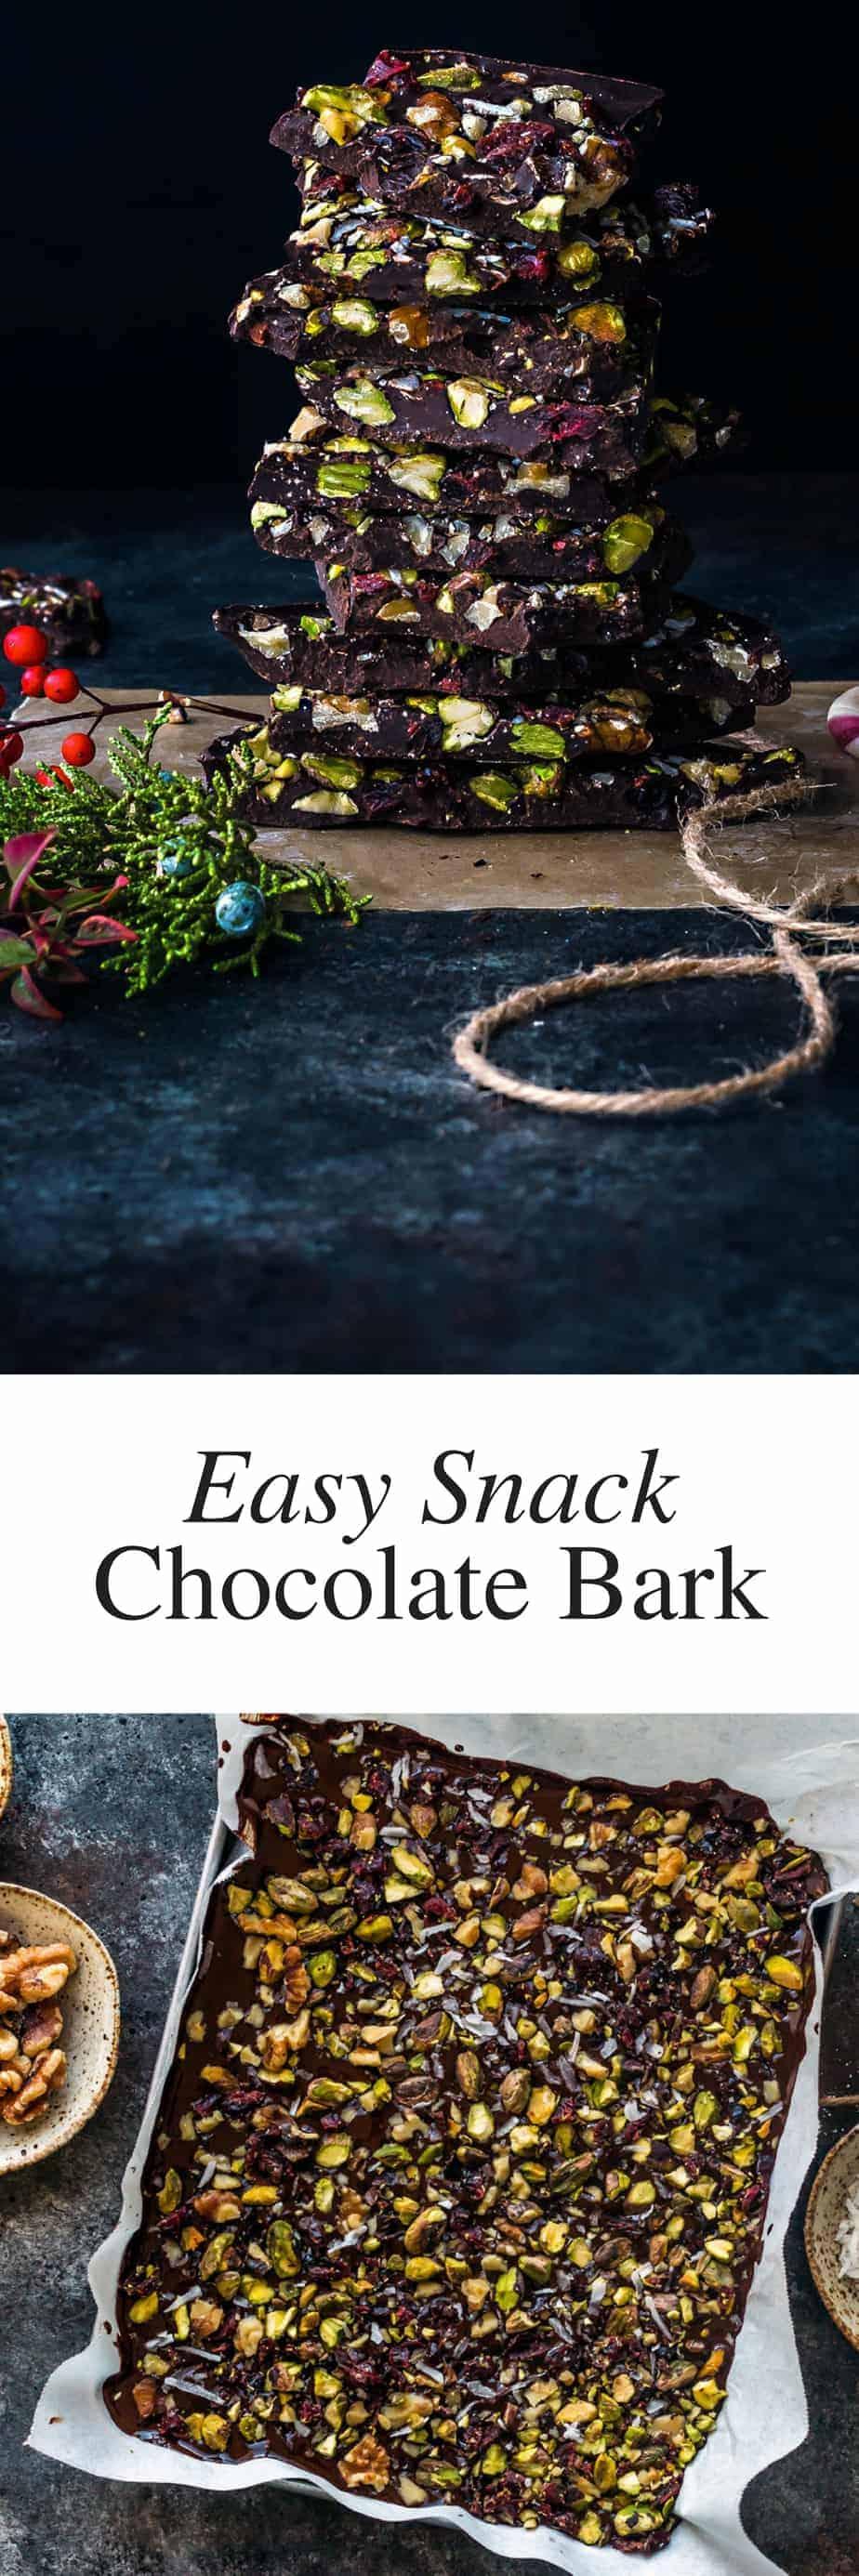 chocolate almond bark recipe with stevia / no calorie sugar splenda stevia. Suitable for diabetes